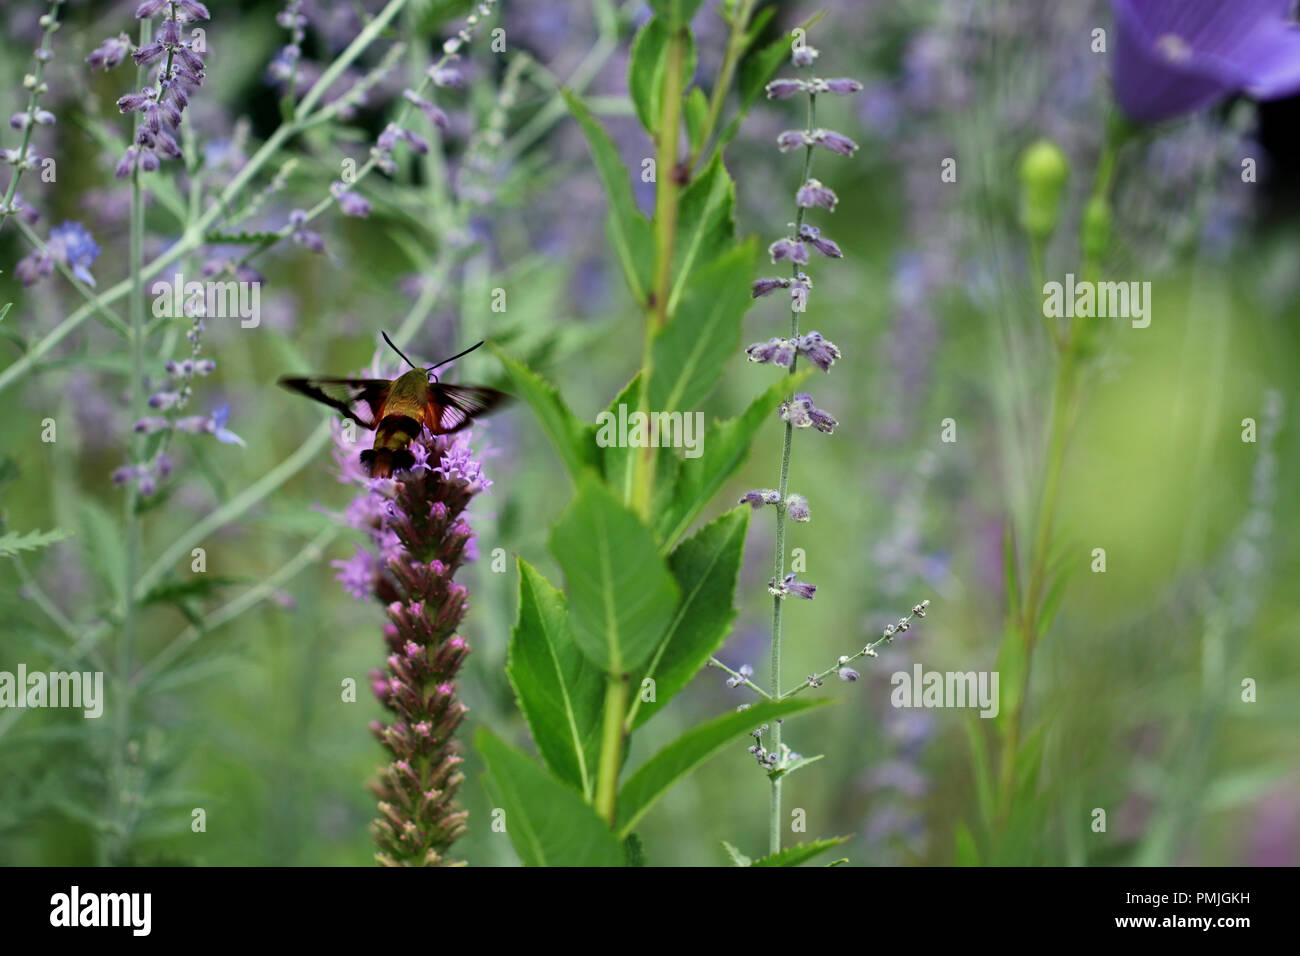 A hummingbird clearwing moth (Hemaris thysbe) feeding on blazing star (Liatris spicata) in a New England garden in summer Stock Photo